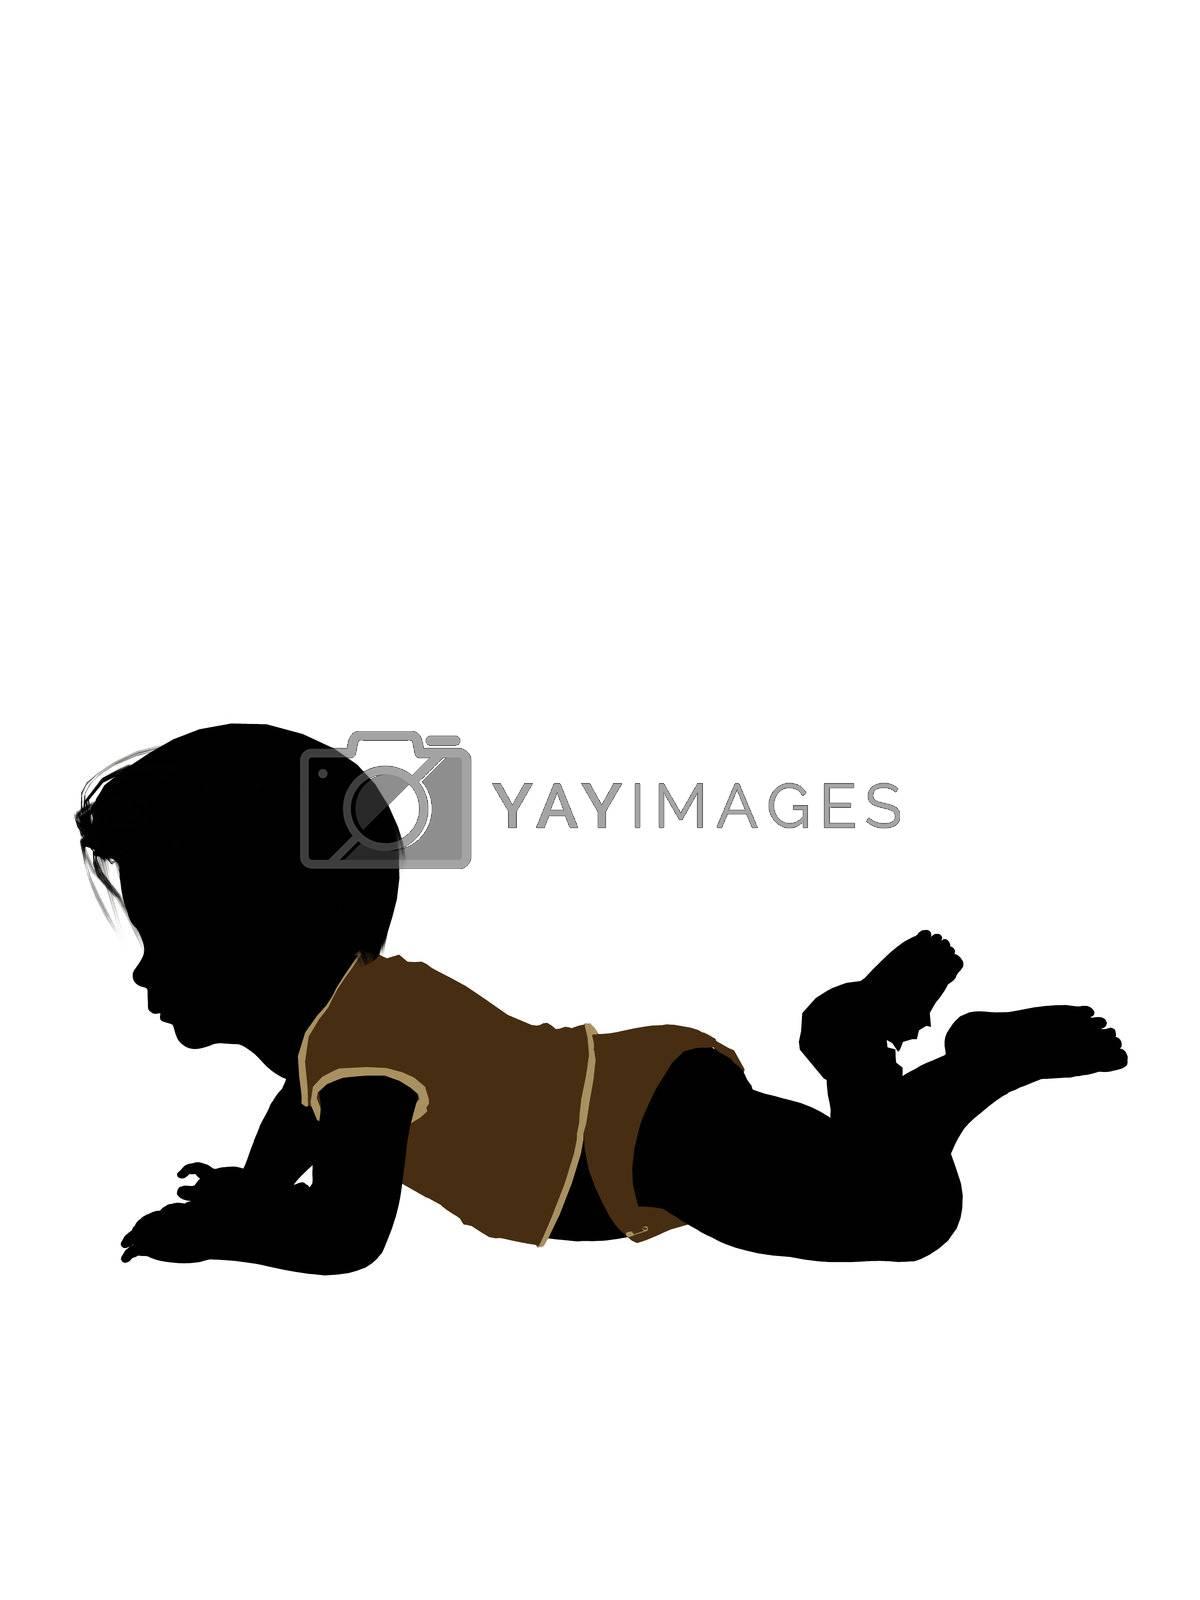 Male Infant Toddler Illustration Silhouette by kathygold